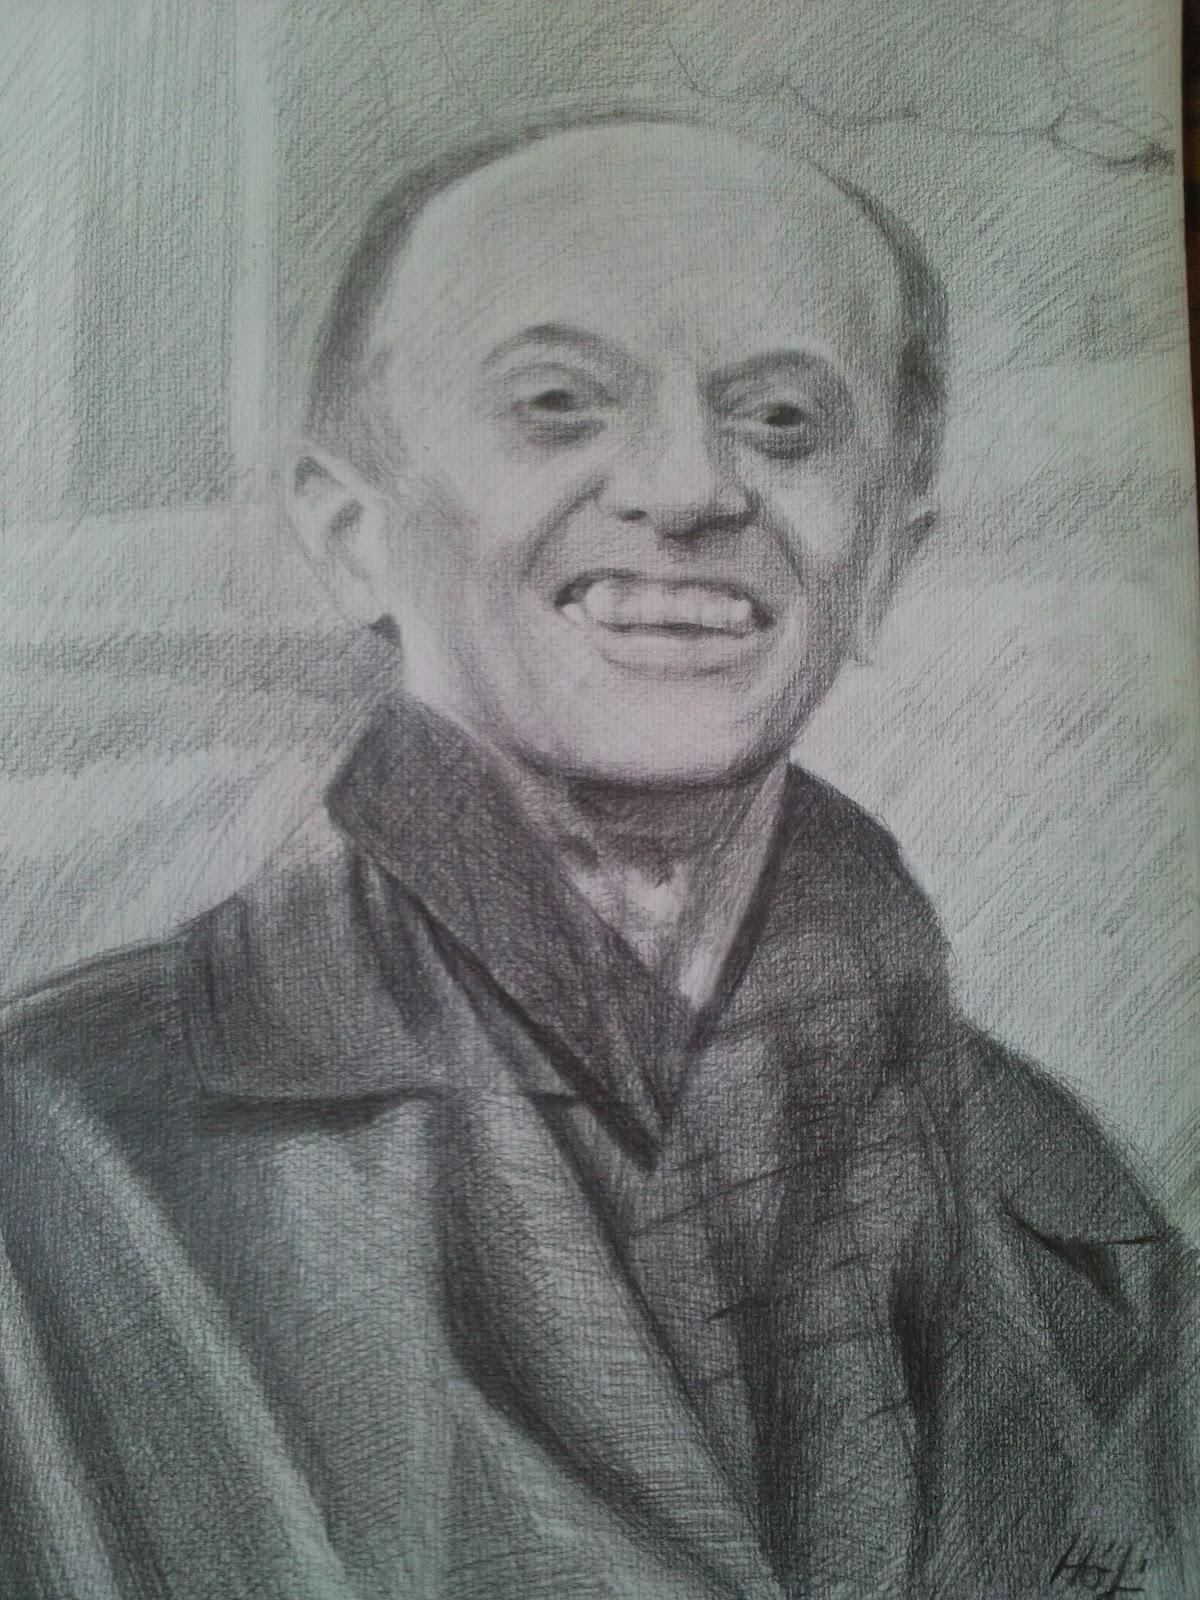 portré, ceruzarajz, fotó